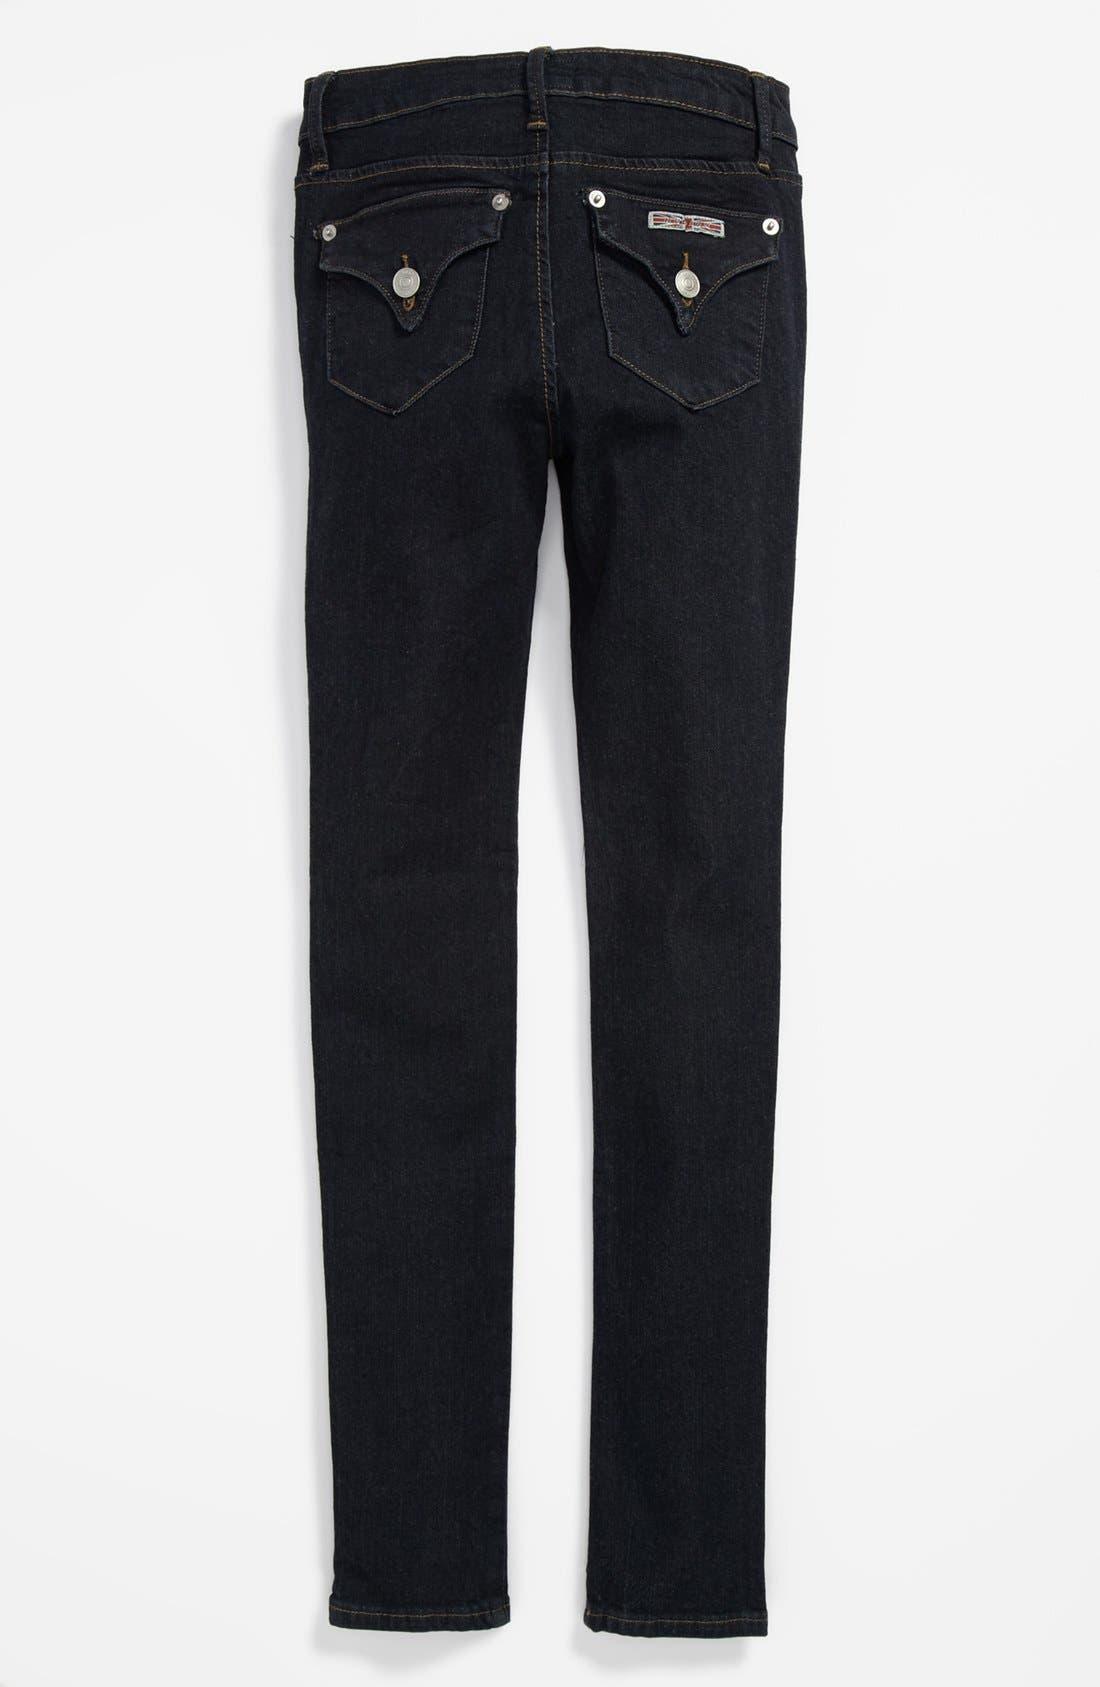 Main Image - Hudson Kids 'Collin' Skinny Jeans (Big Girls) (Online Only)